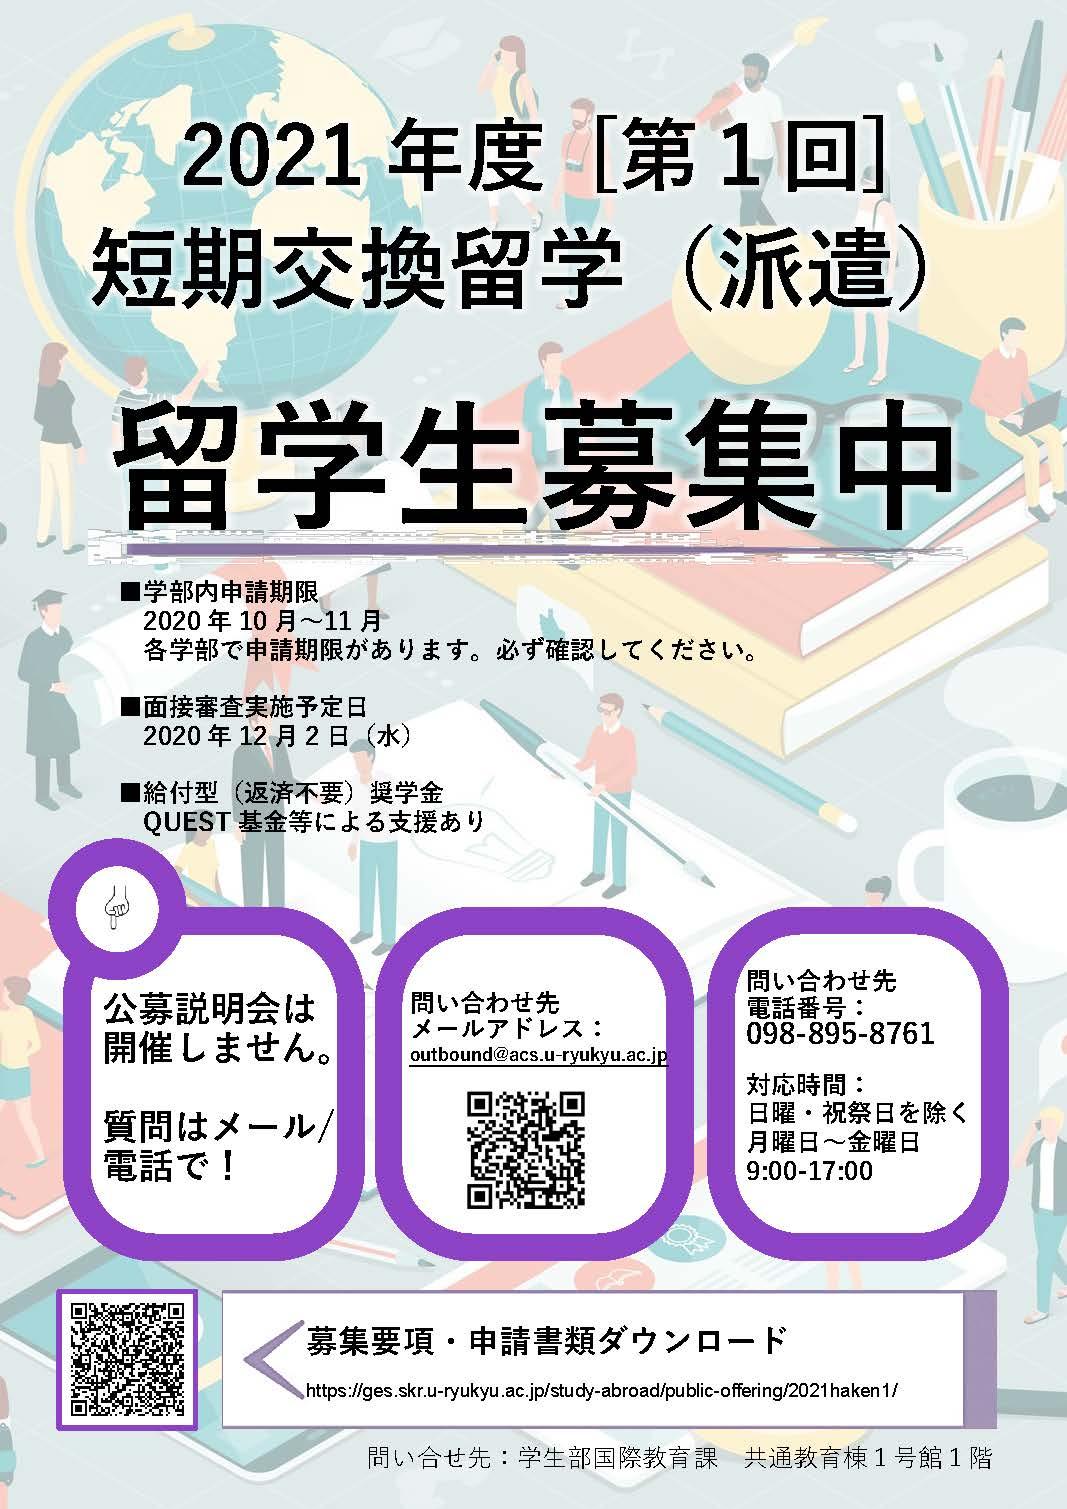 https://ges.skr.u-ryukyu.ac.jp/wp-content/uploads/2020/10/R03-1Poster.pdf